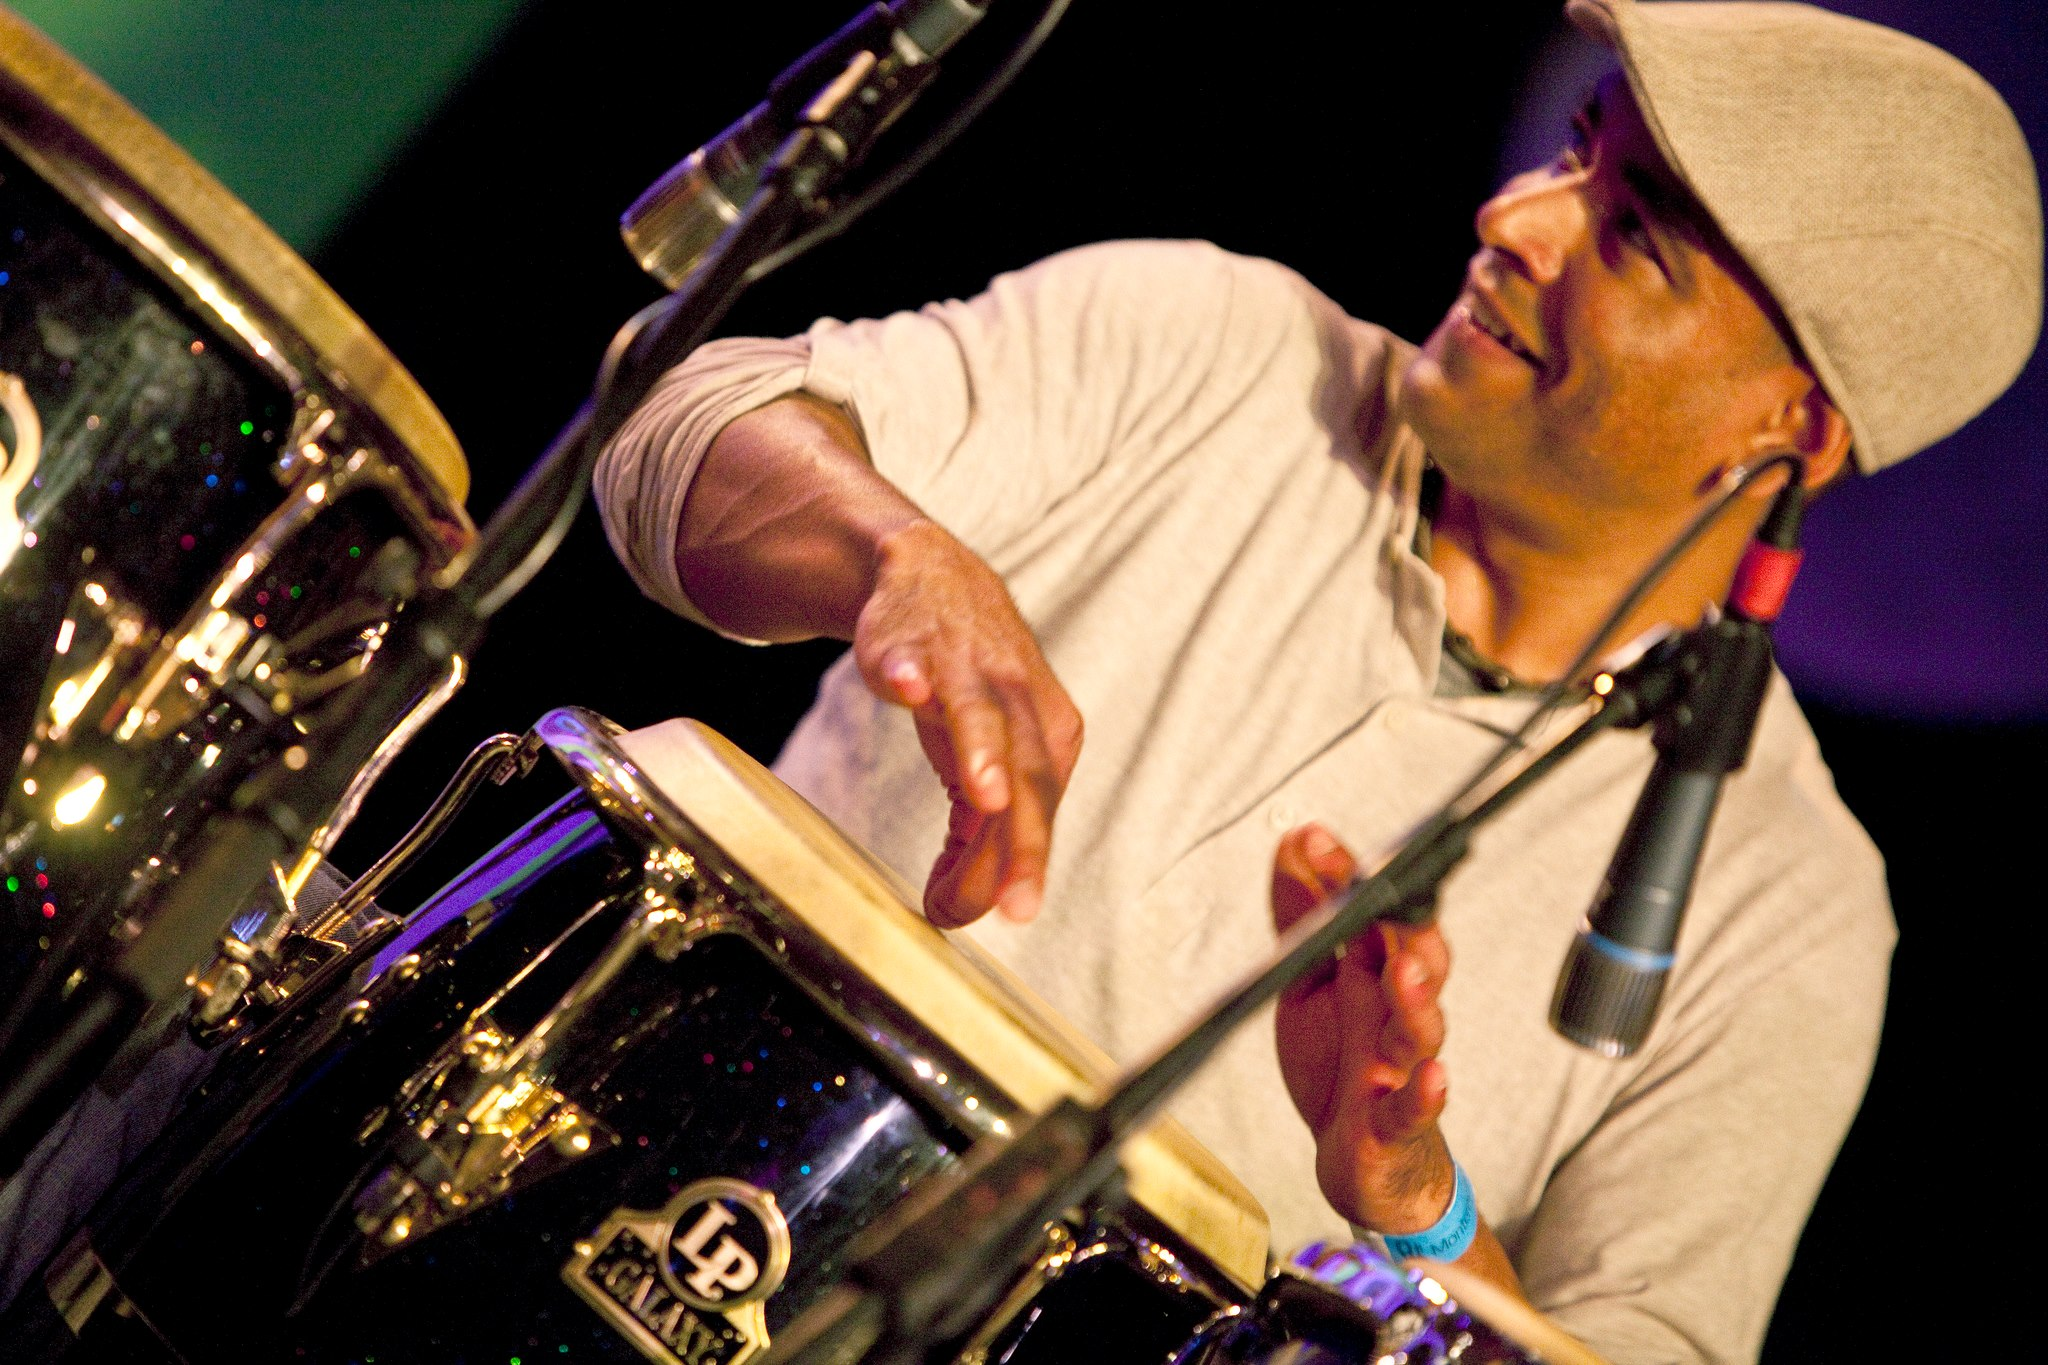 Mauricio Herrera Music - Drummer/Percussionist/Performer/Educator - Official Website